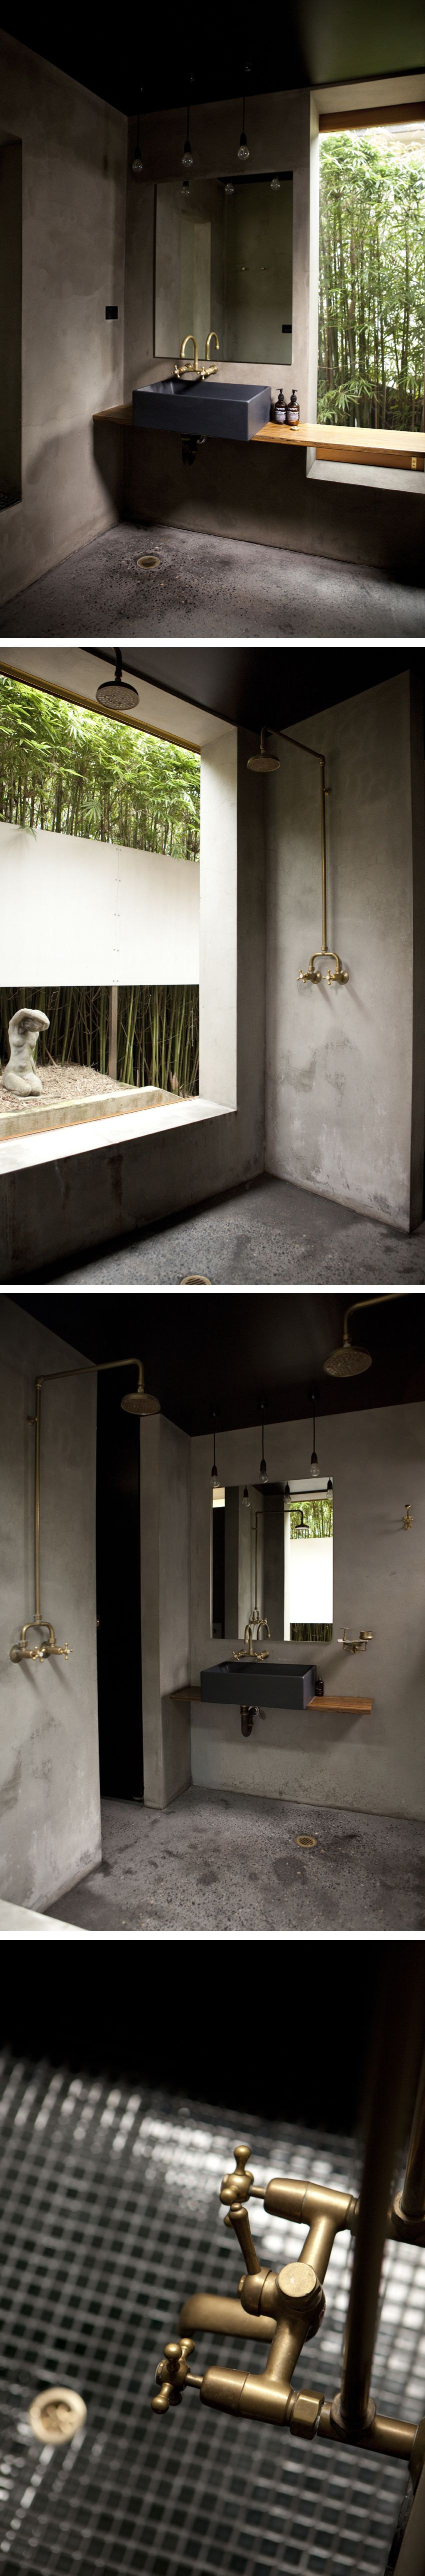 Salle De Bain Nevers ~ plancher b ton inspiration nevers pinterest beton salle de